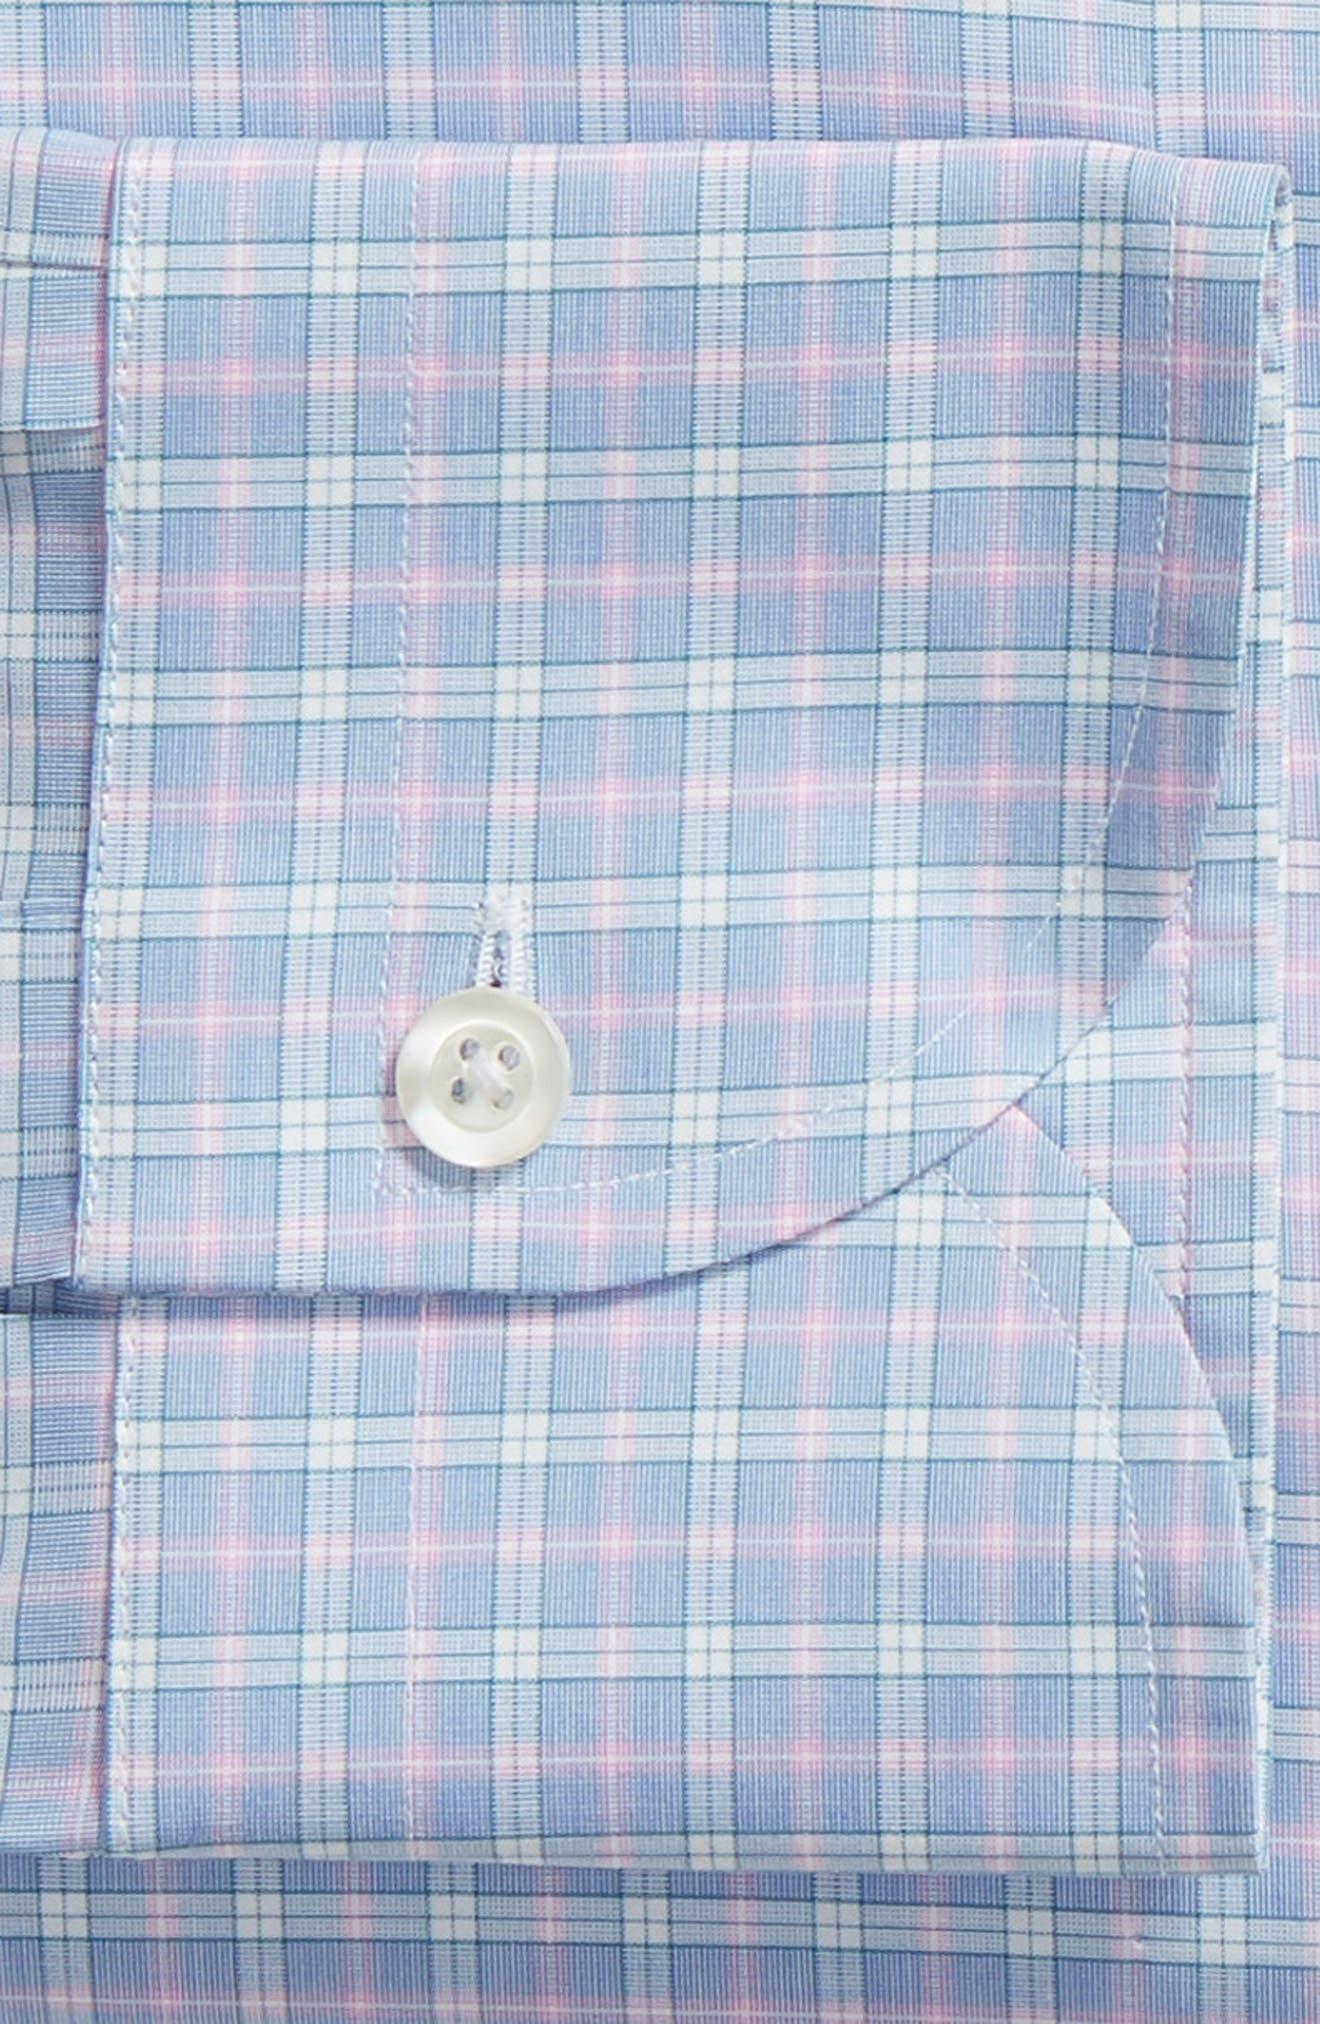 Ferris Slim Fit Check Dress Shirt,                             Alternate thumbnail 6, color,                             LIGHT/ PASTEL BLUE